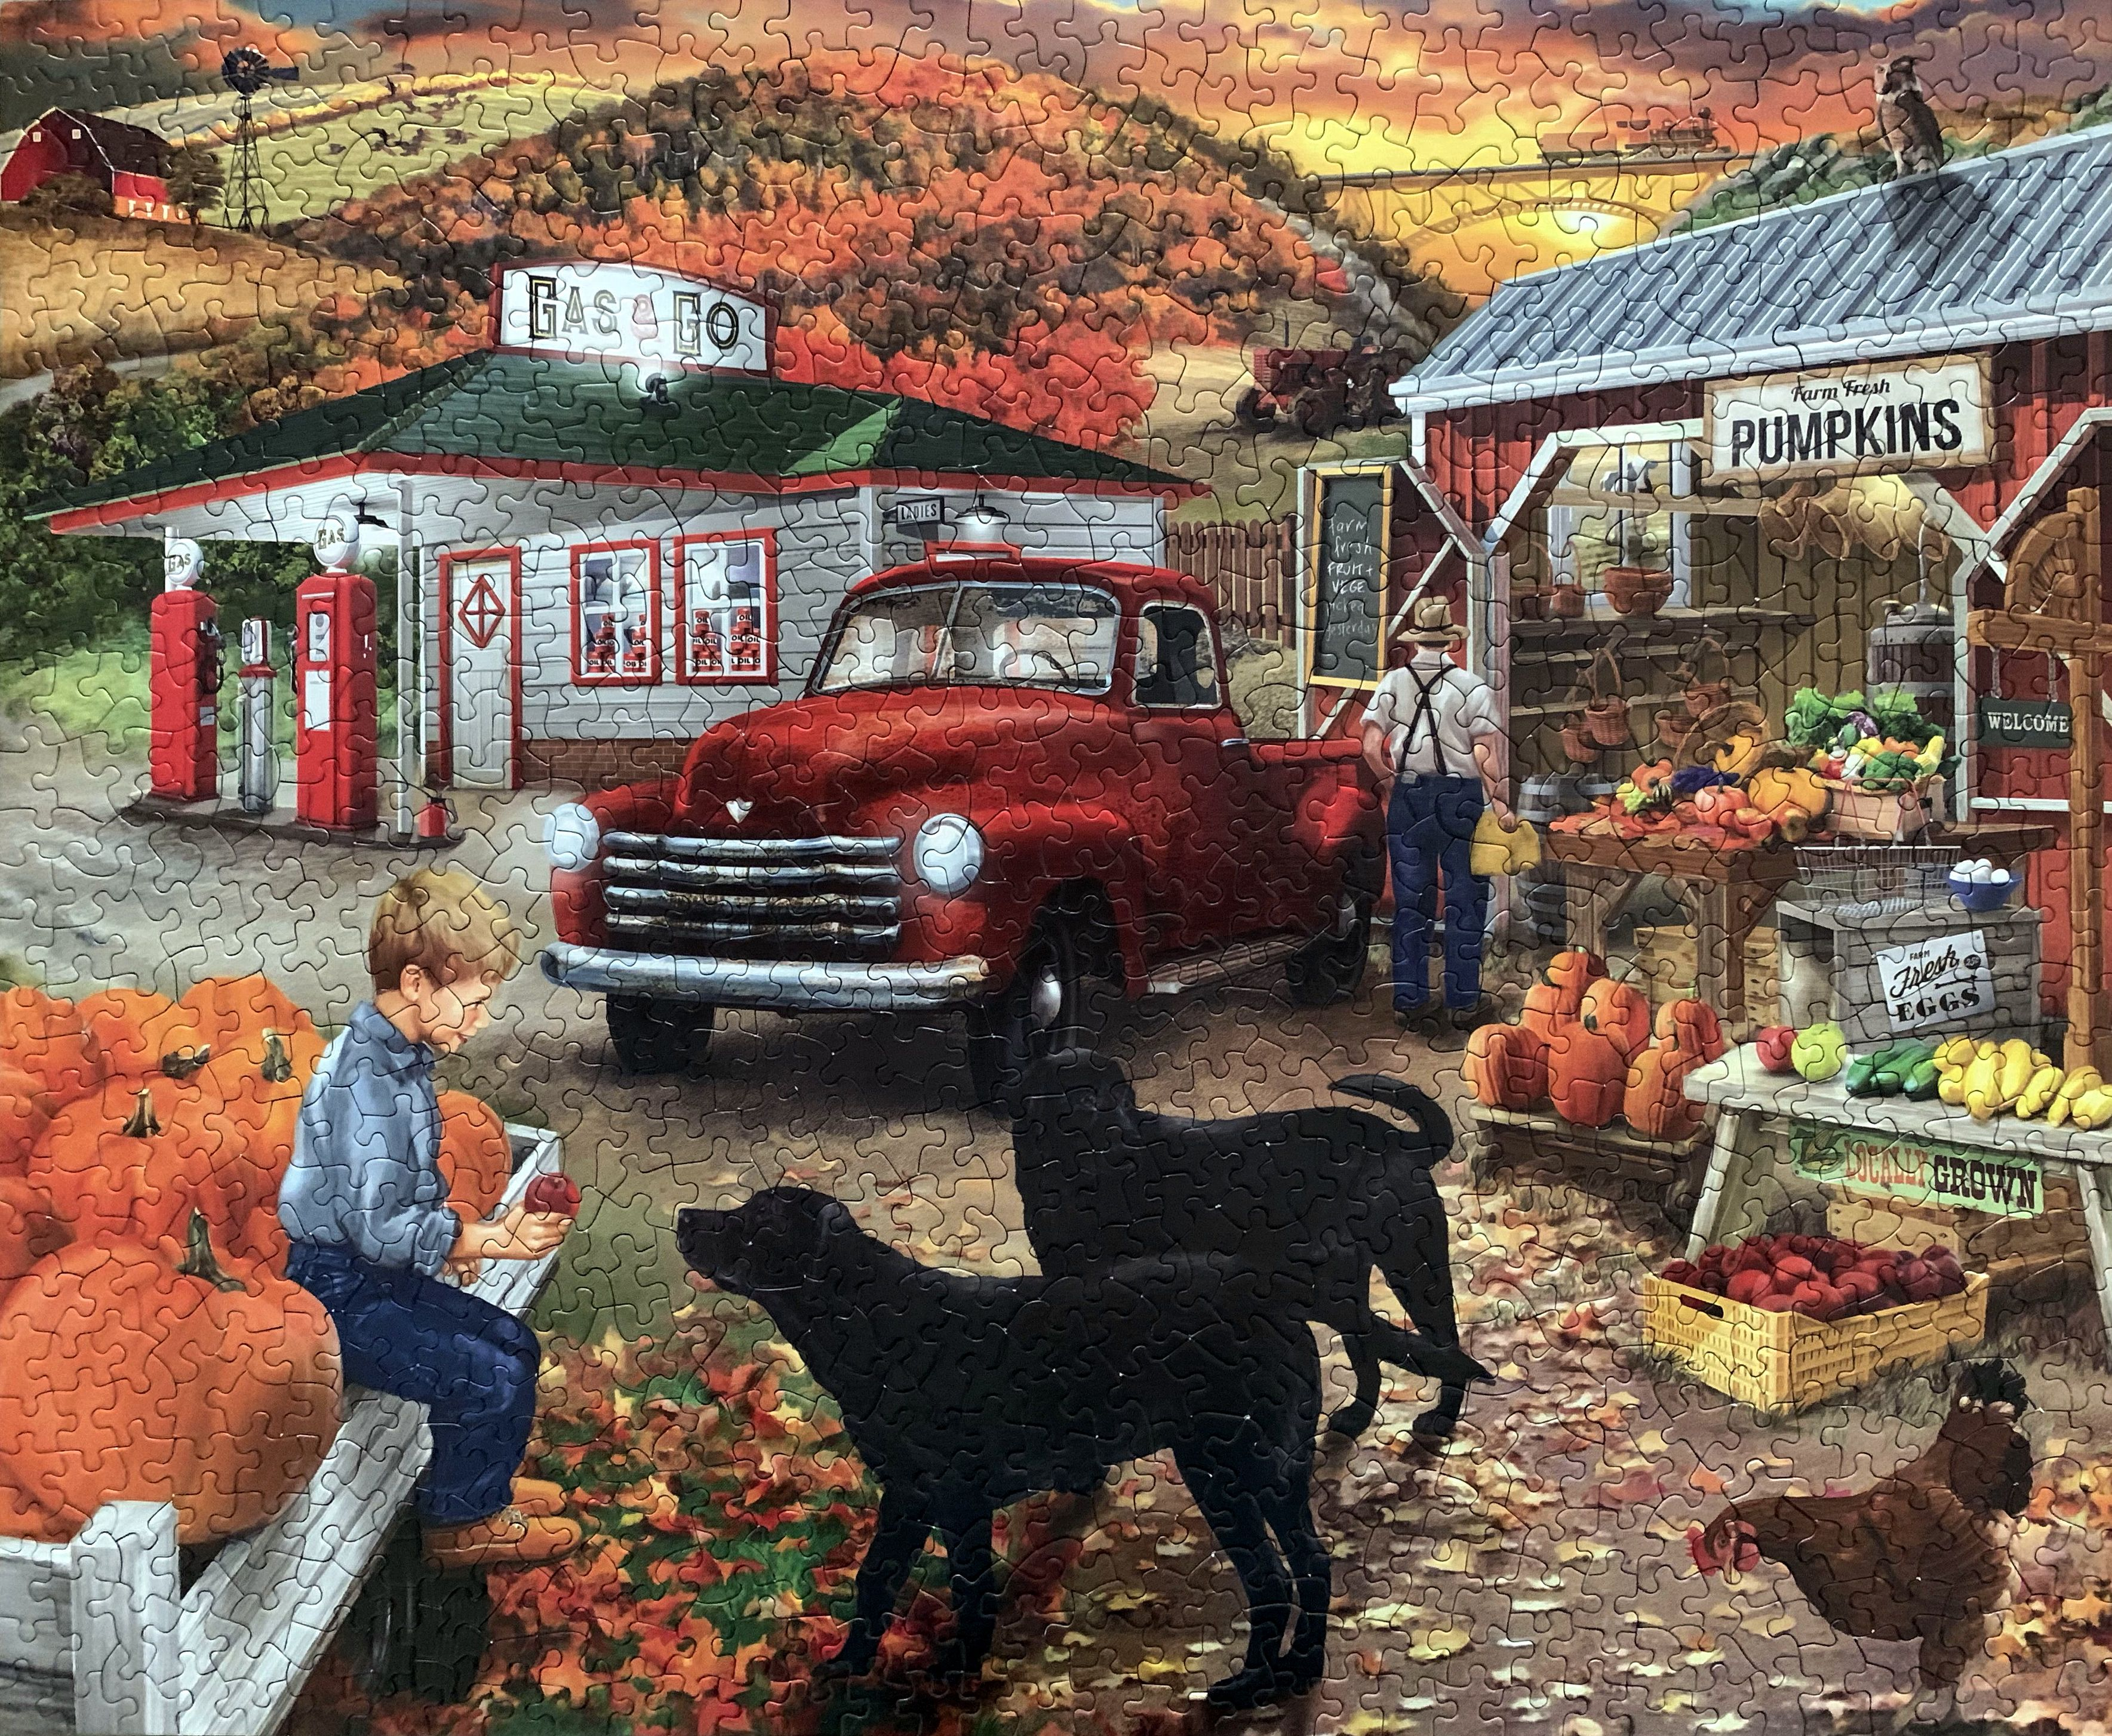 Roadside Stand, Art by Bigelow Illustrations, release year